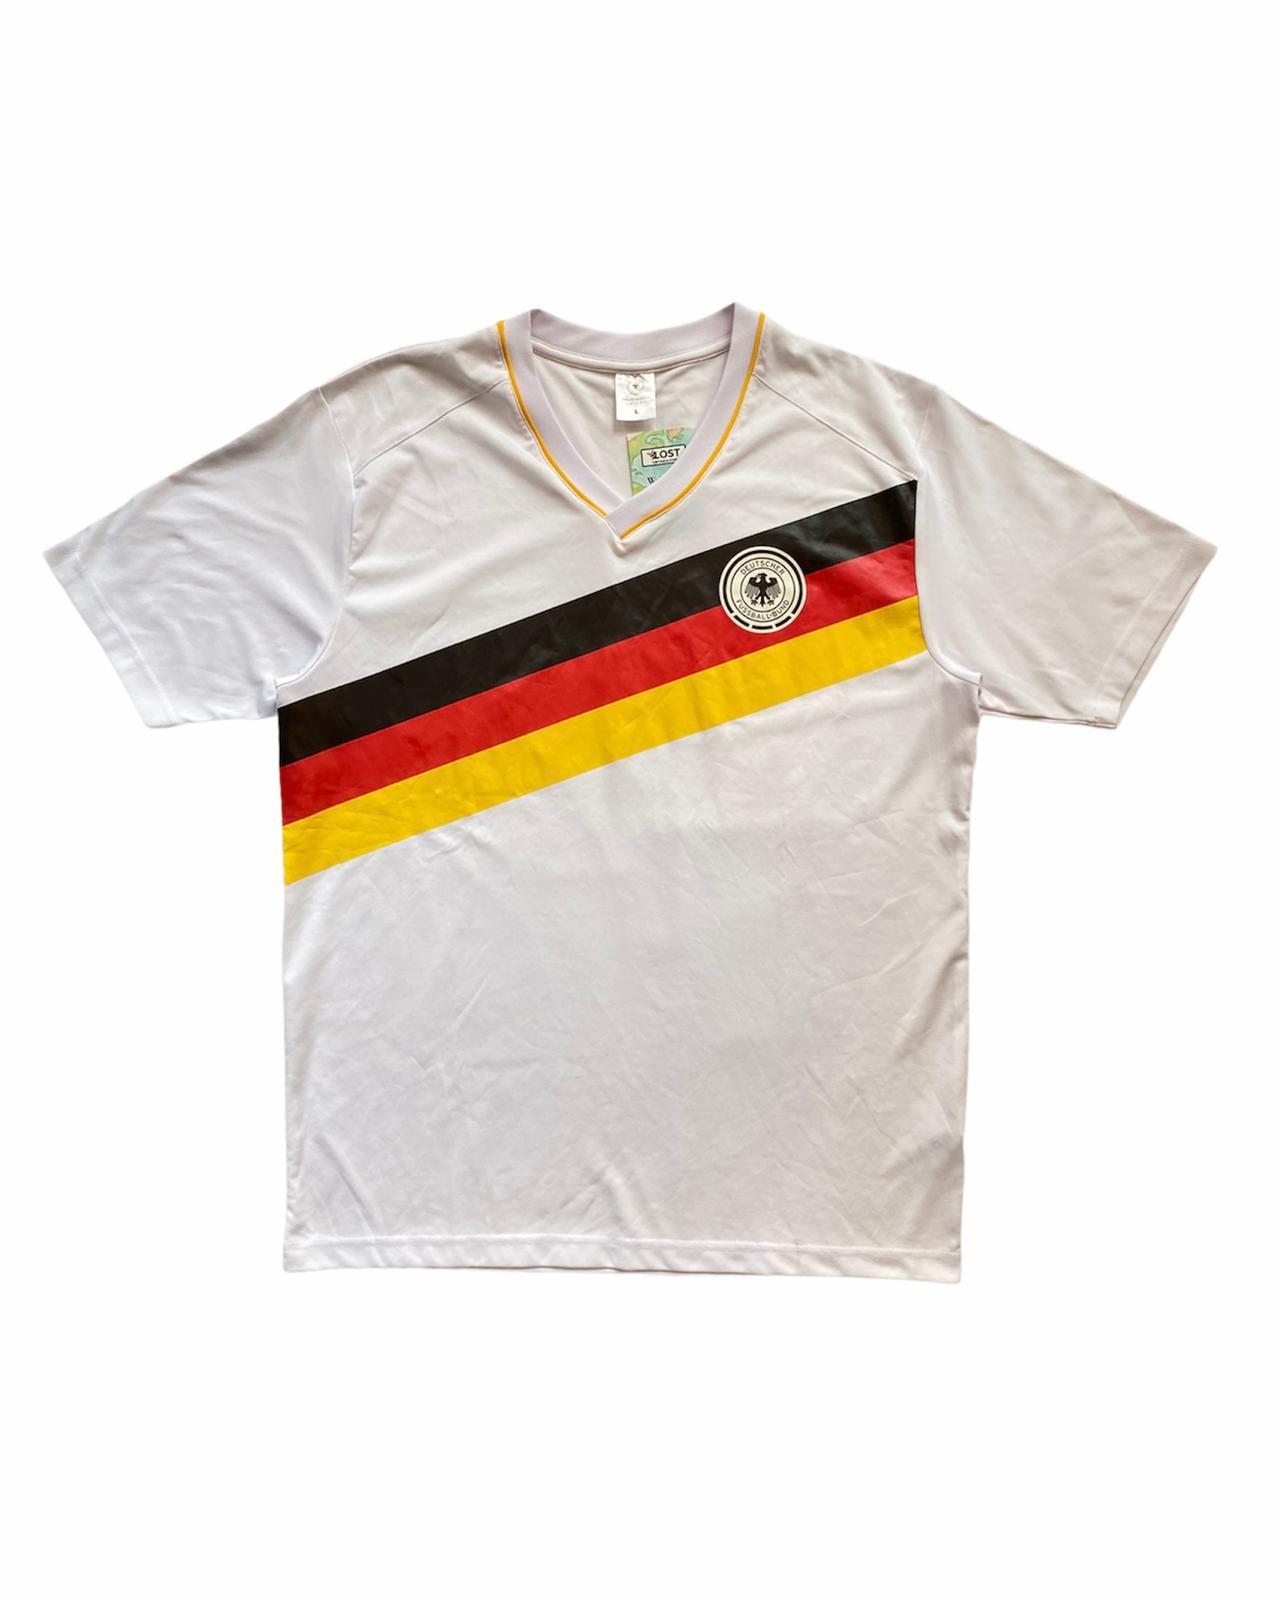 Germany Retro 90's Jersey (L)